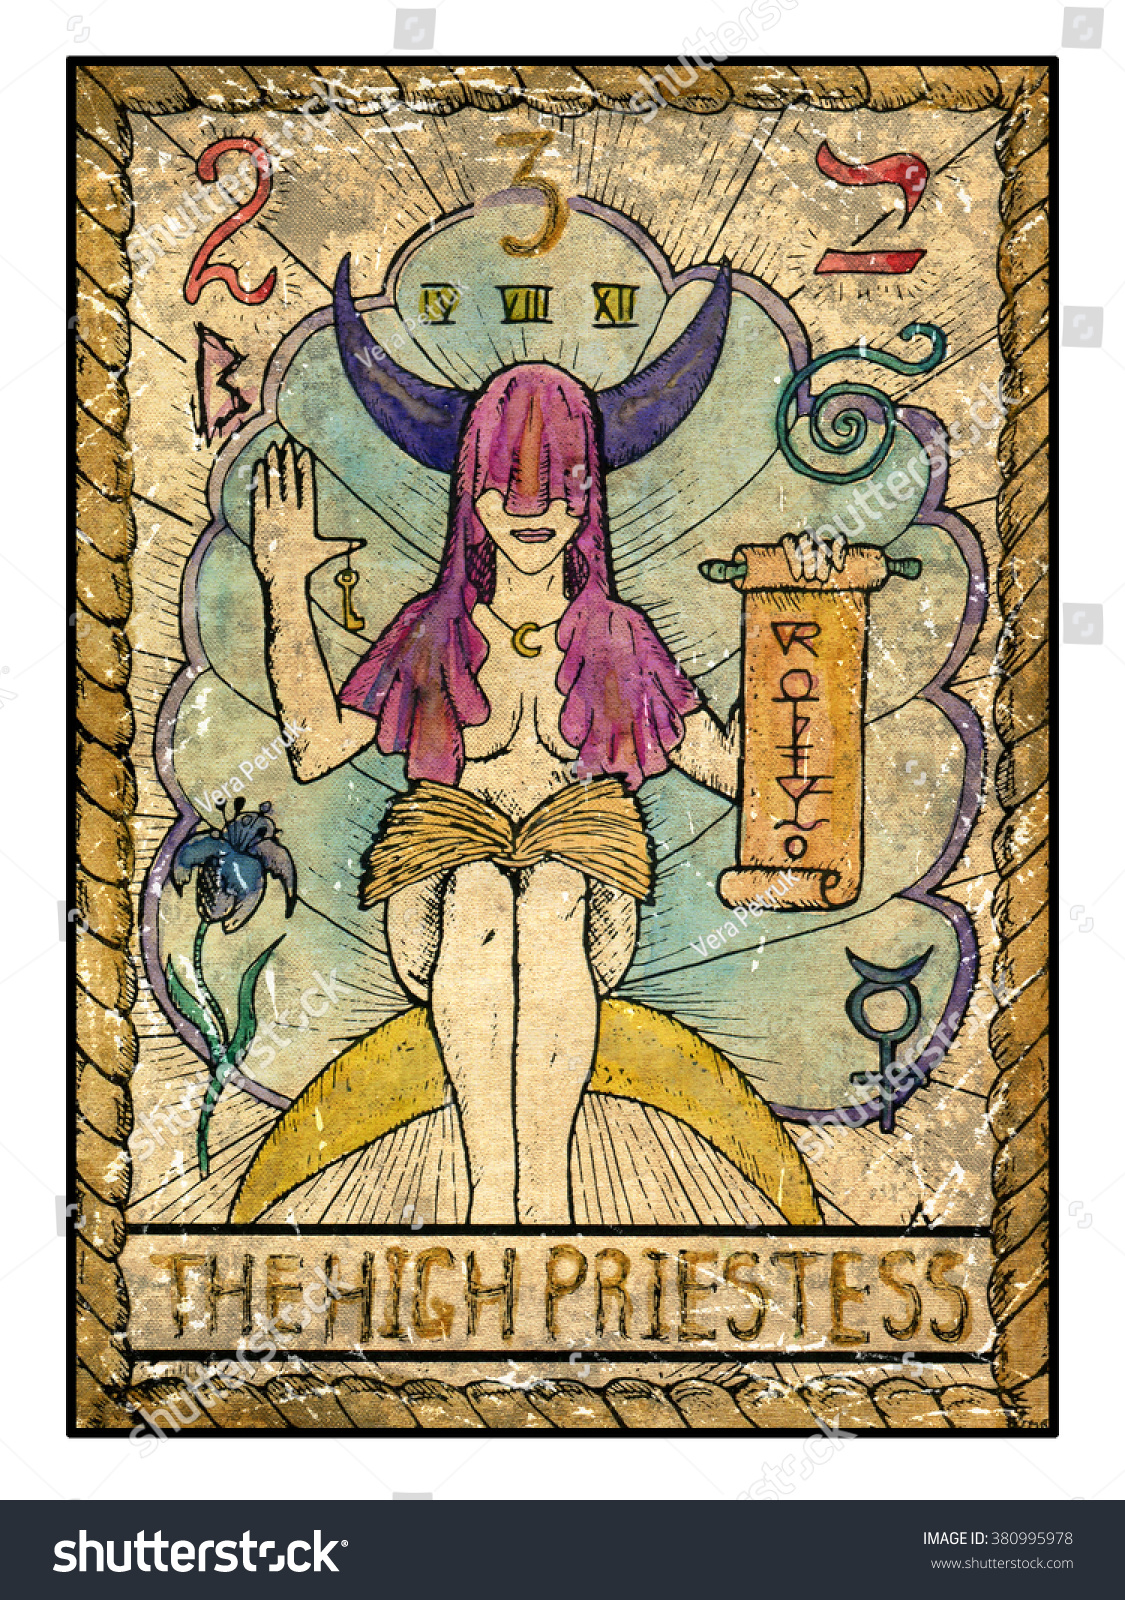 High Priestess Full Colorful Deck Major Stock Illustration